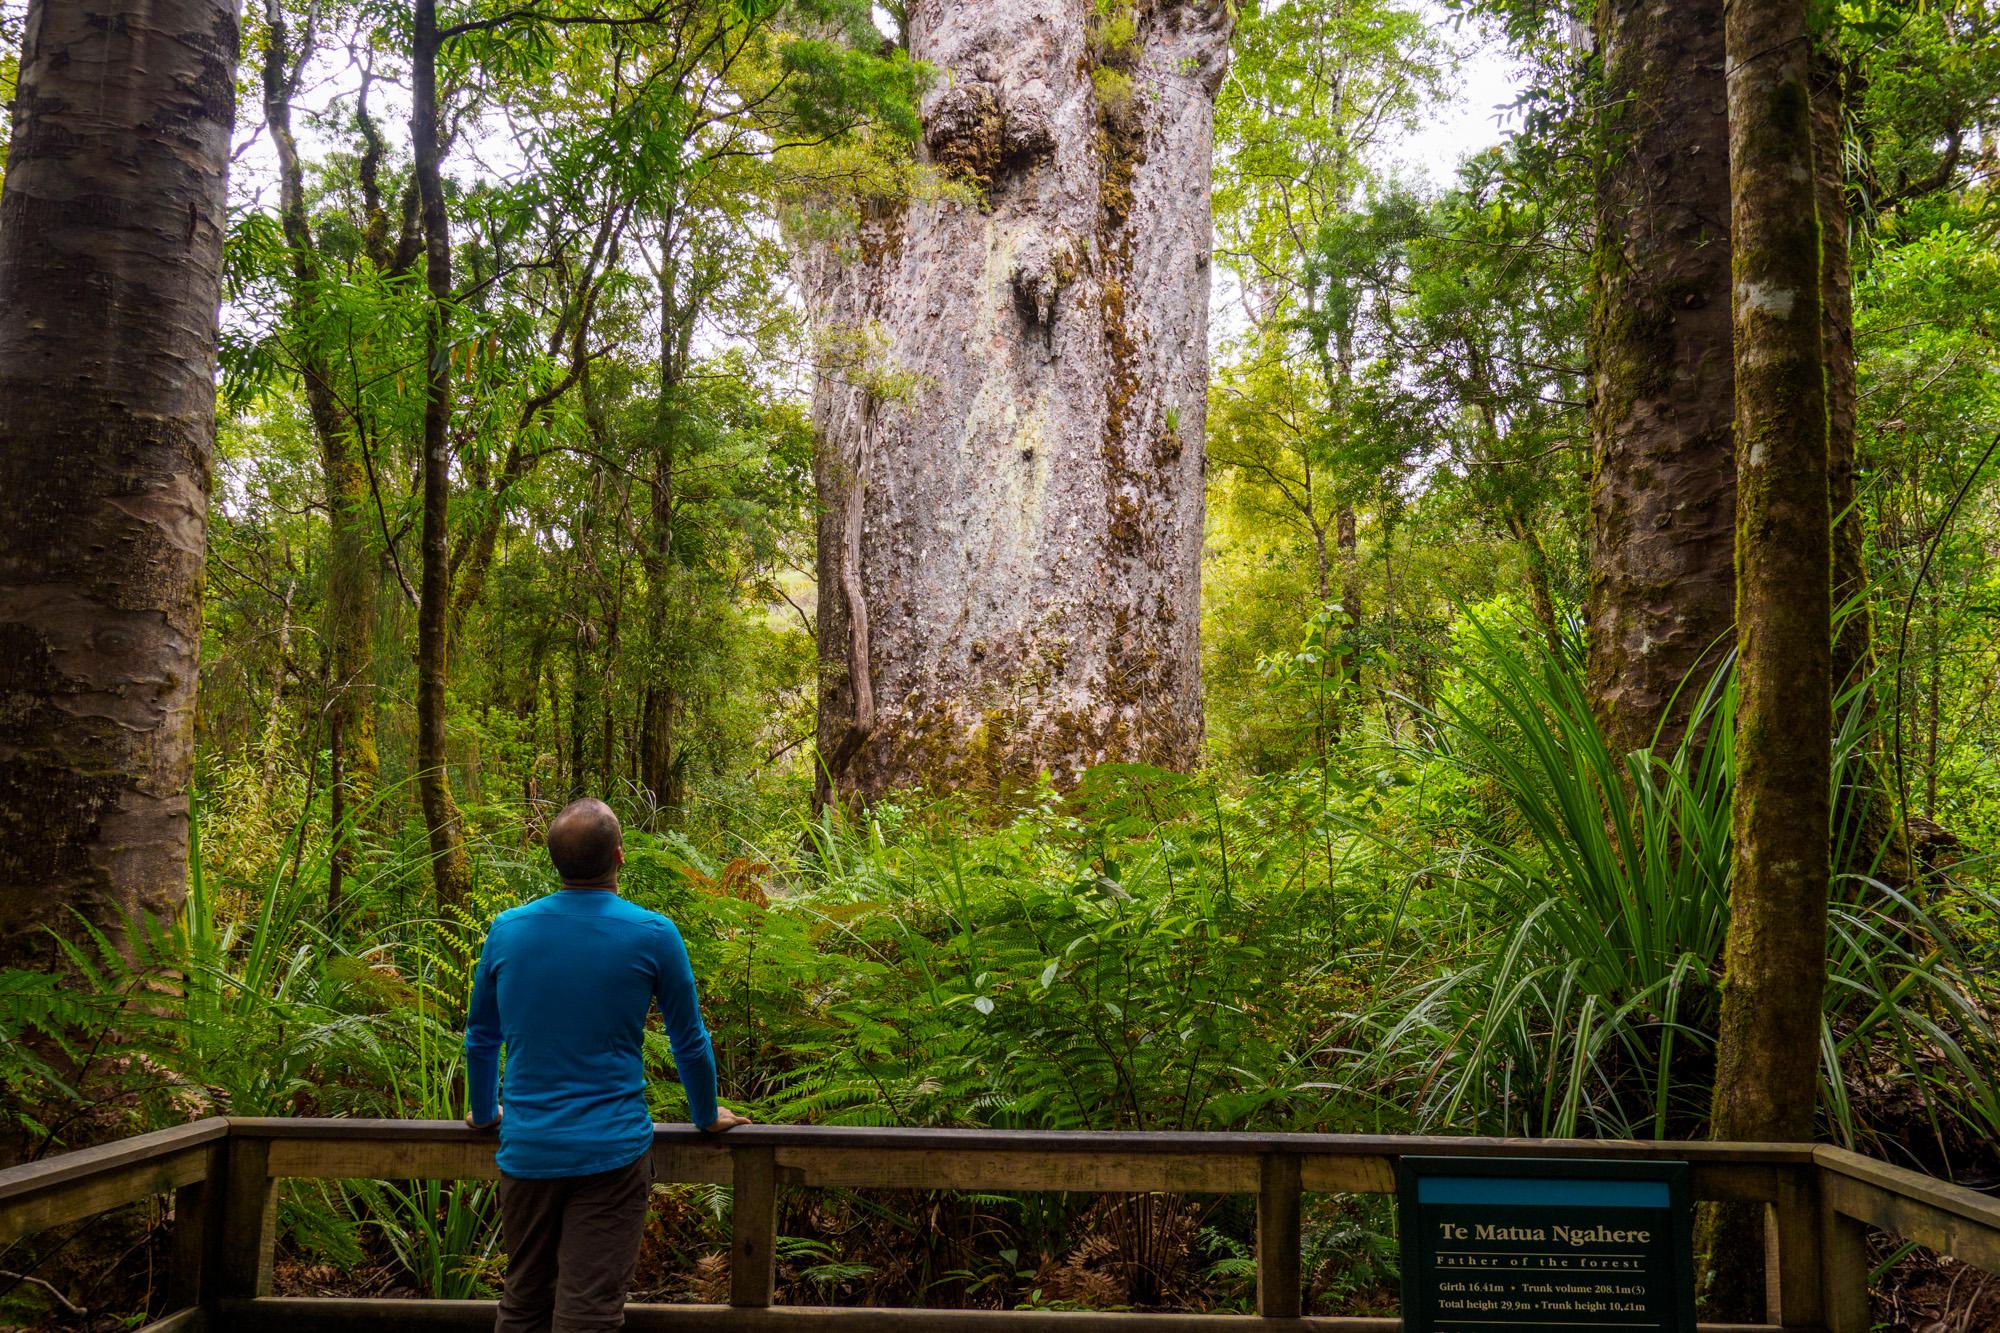 Northlands - Te Matua Ngahere im Waipoua Forest